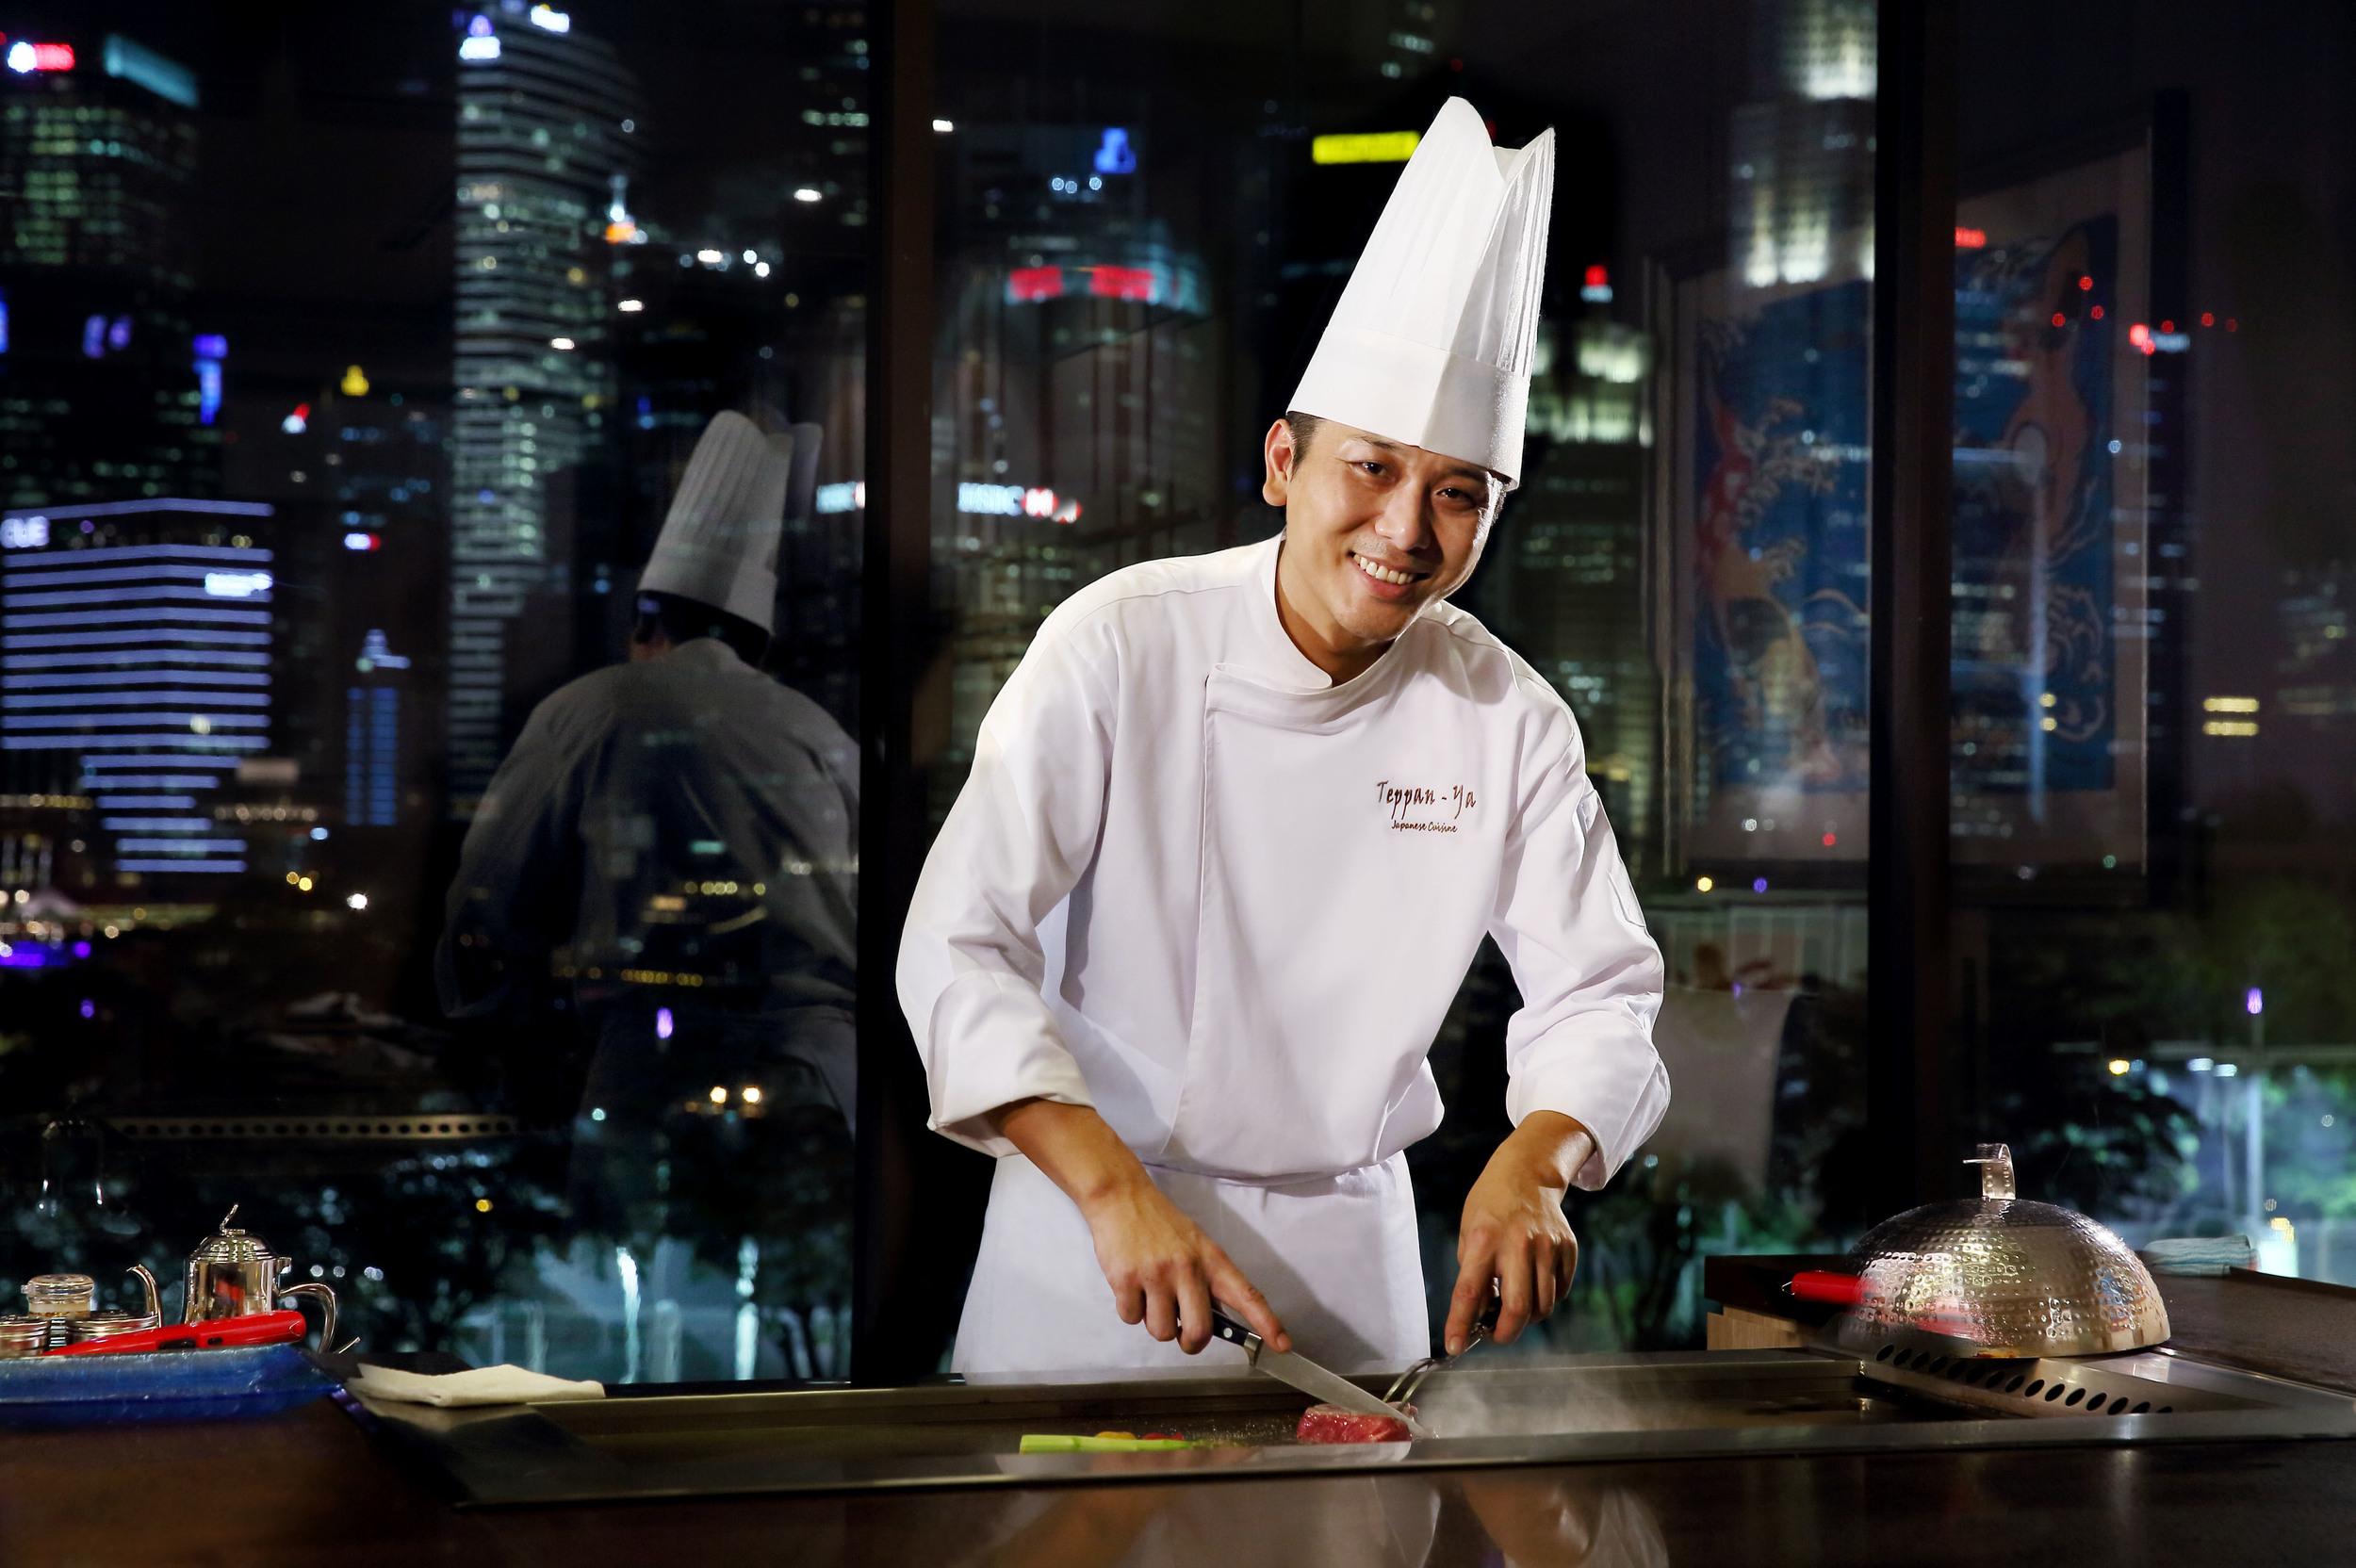 Chef at Teppanyaki counter.jpg